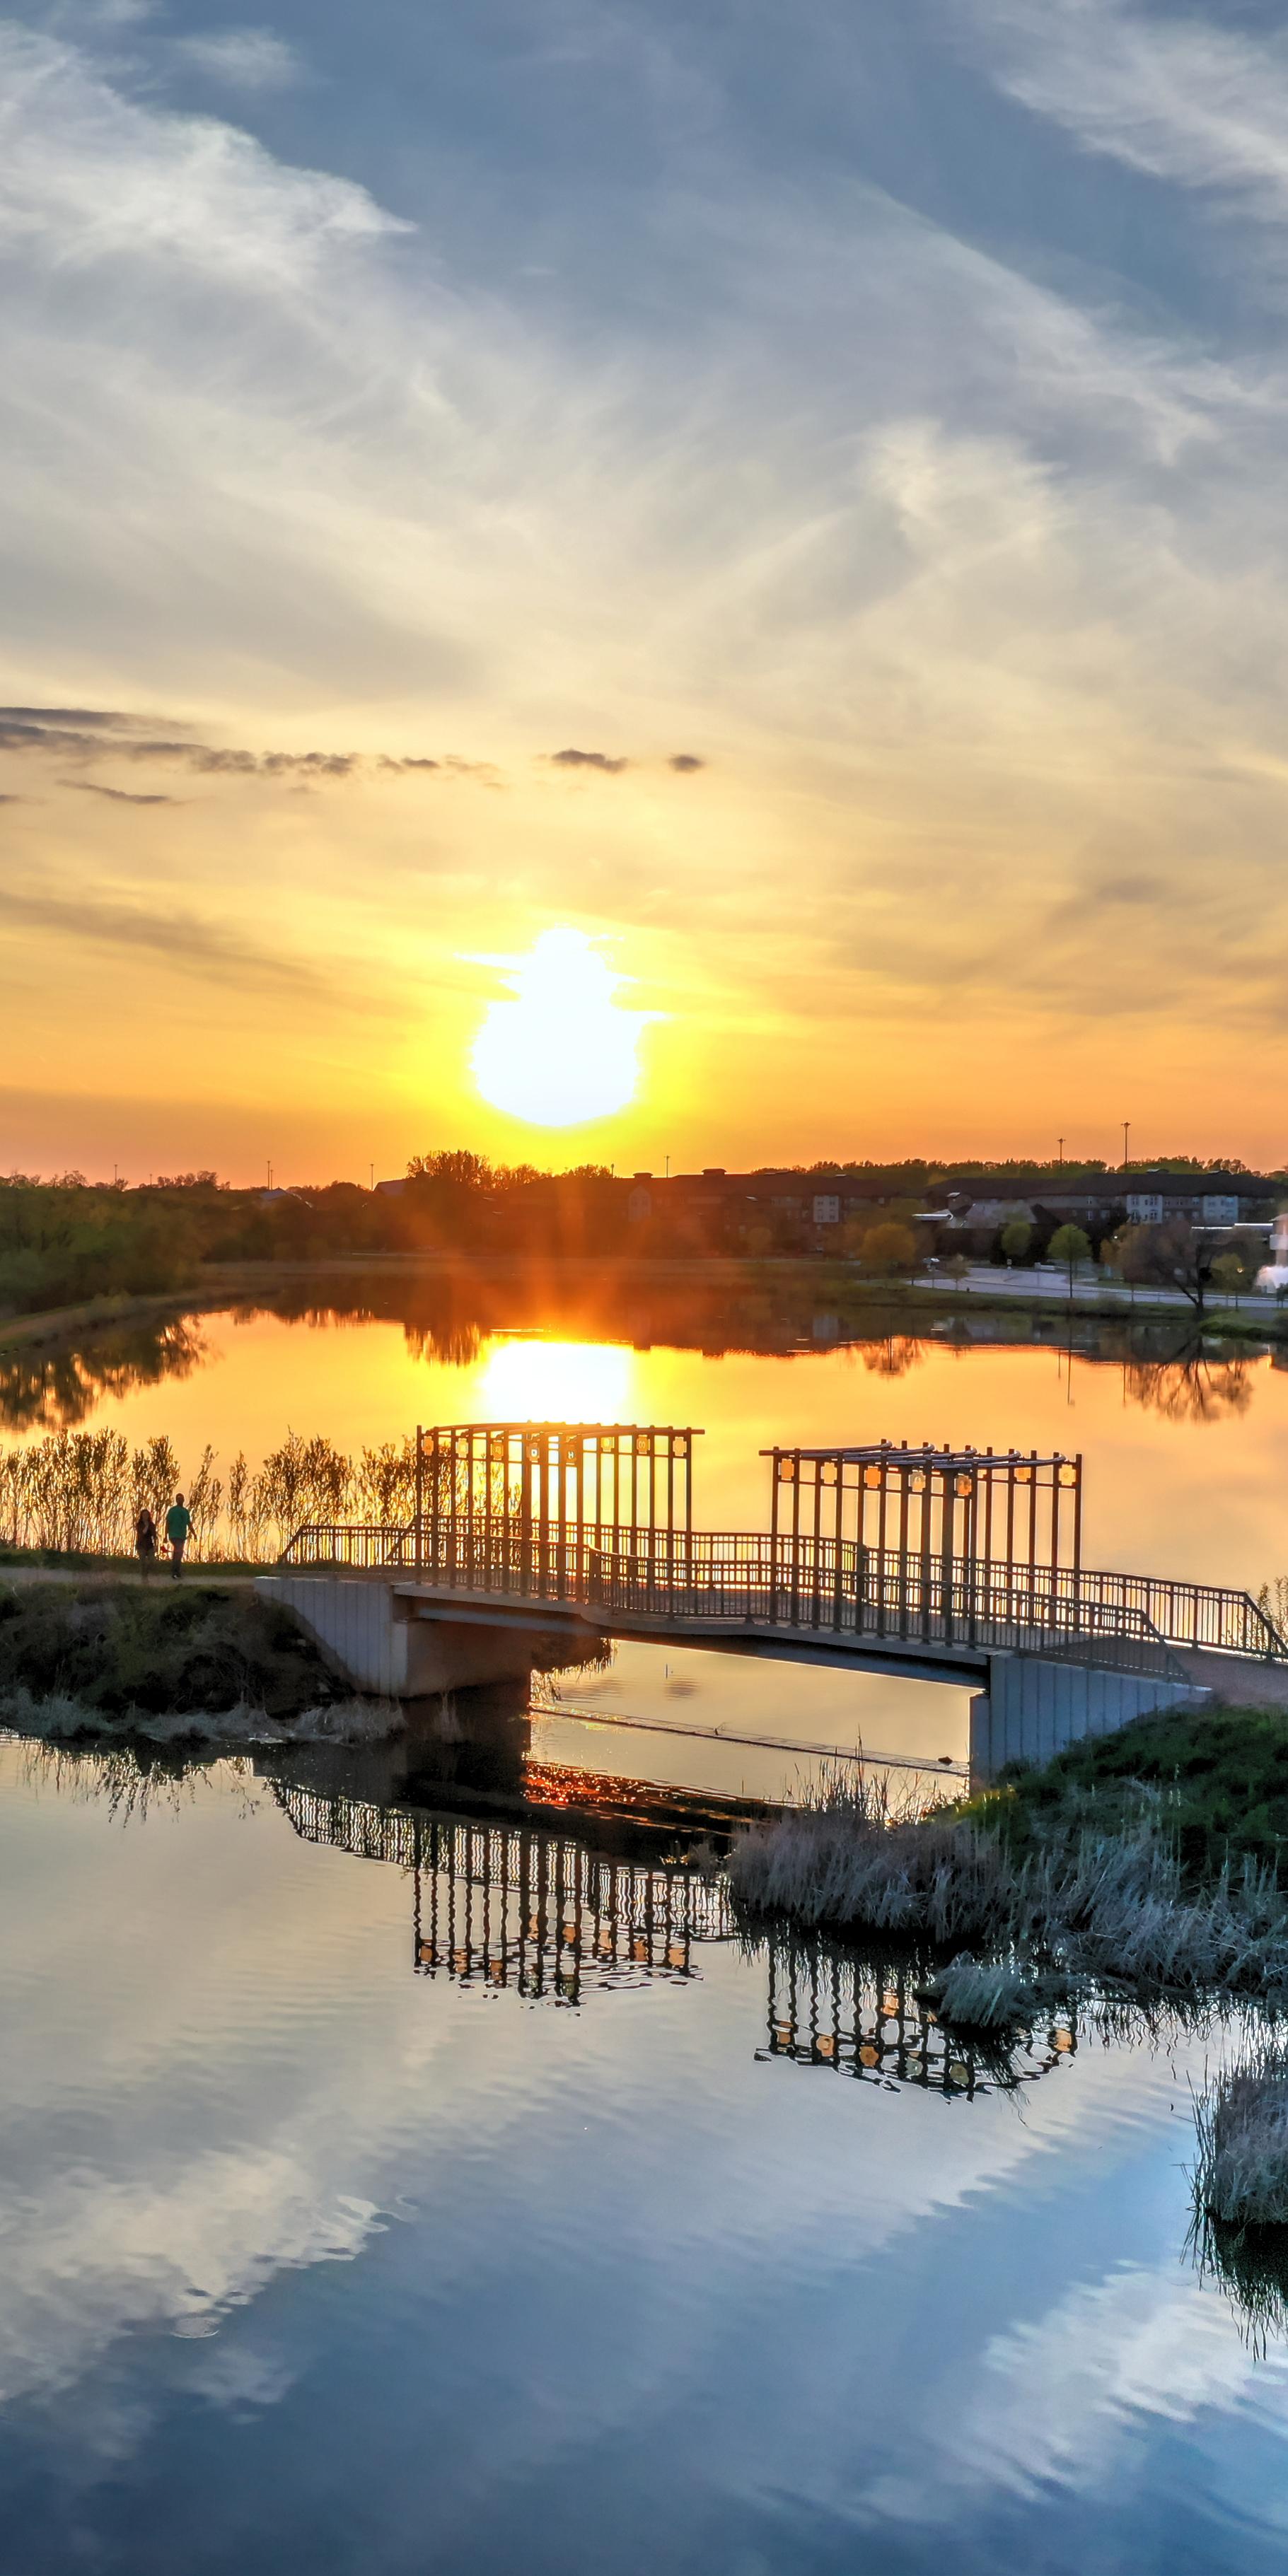 David Gregoire - The Gathering Bridge at Purgatory Creek Park